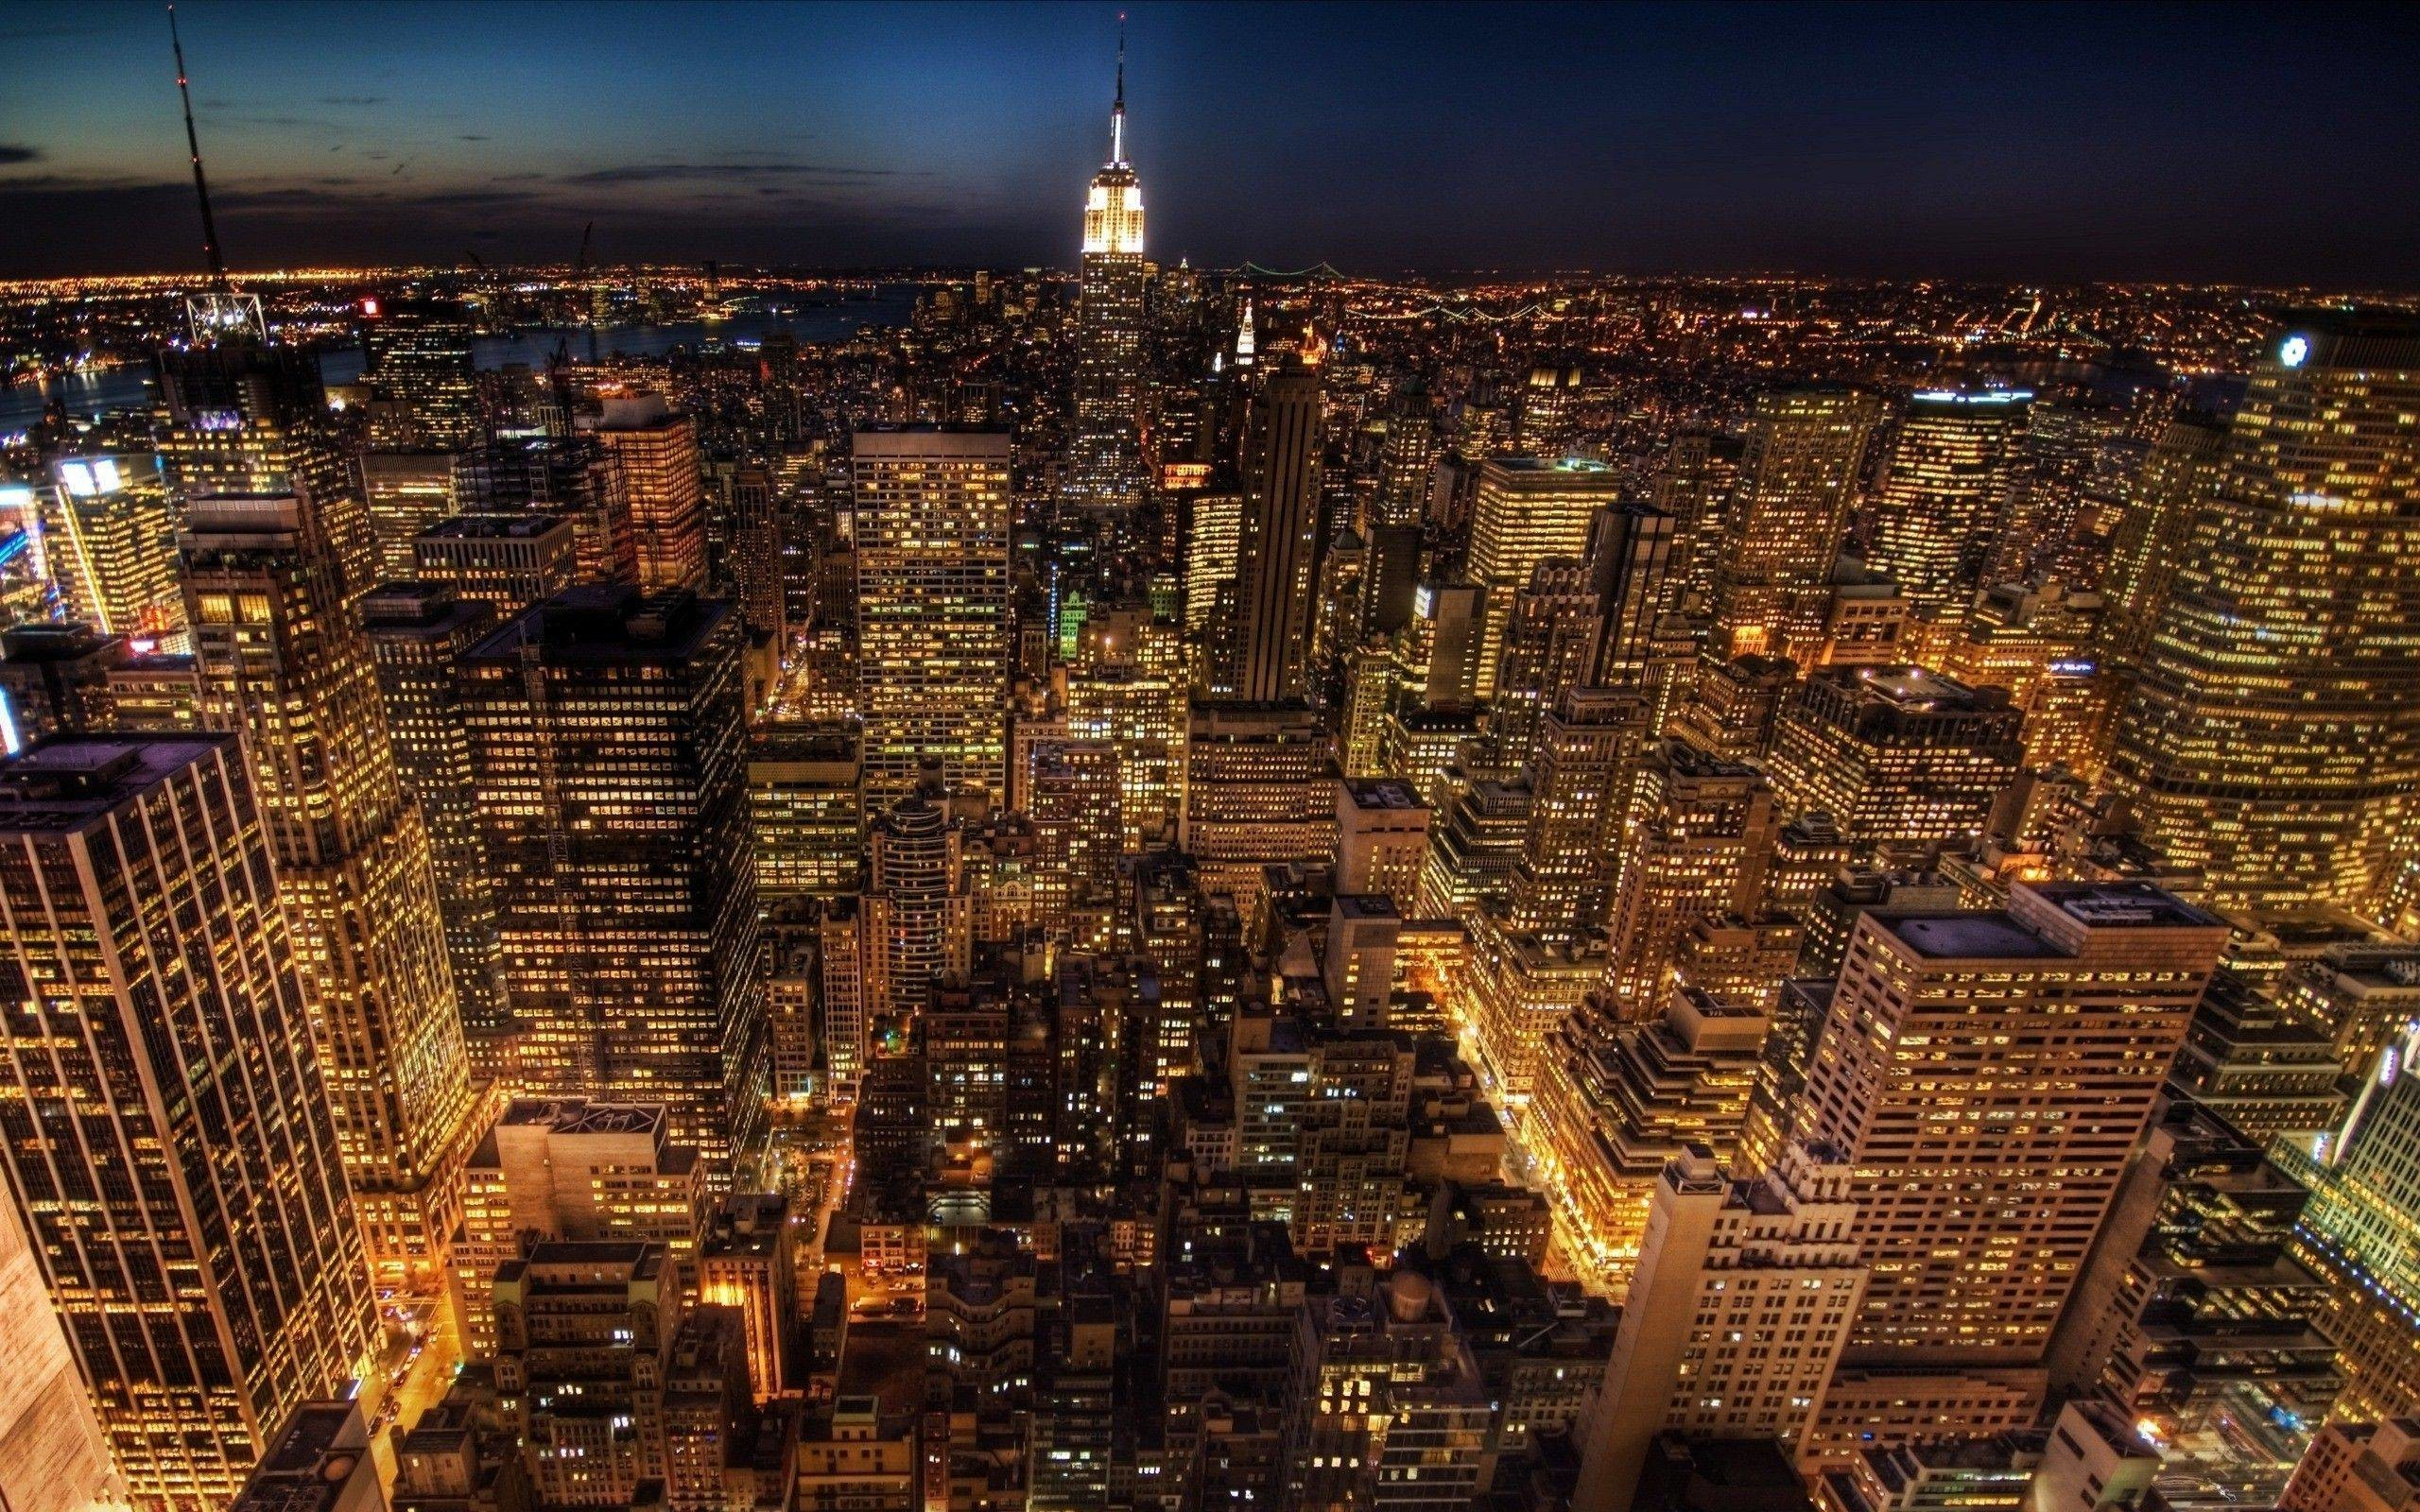 4464-new-york-city-1920×1080-world-wallpaper.jpg (1920×1080) | Night With  Moolight | Pinterest